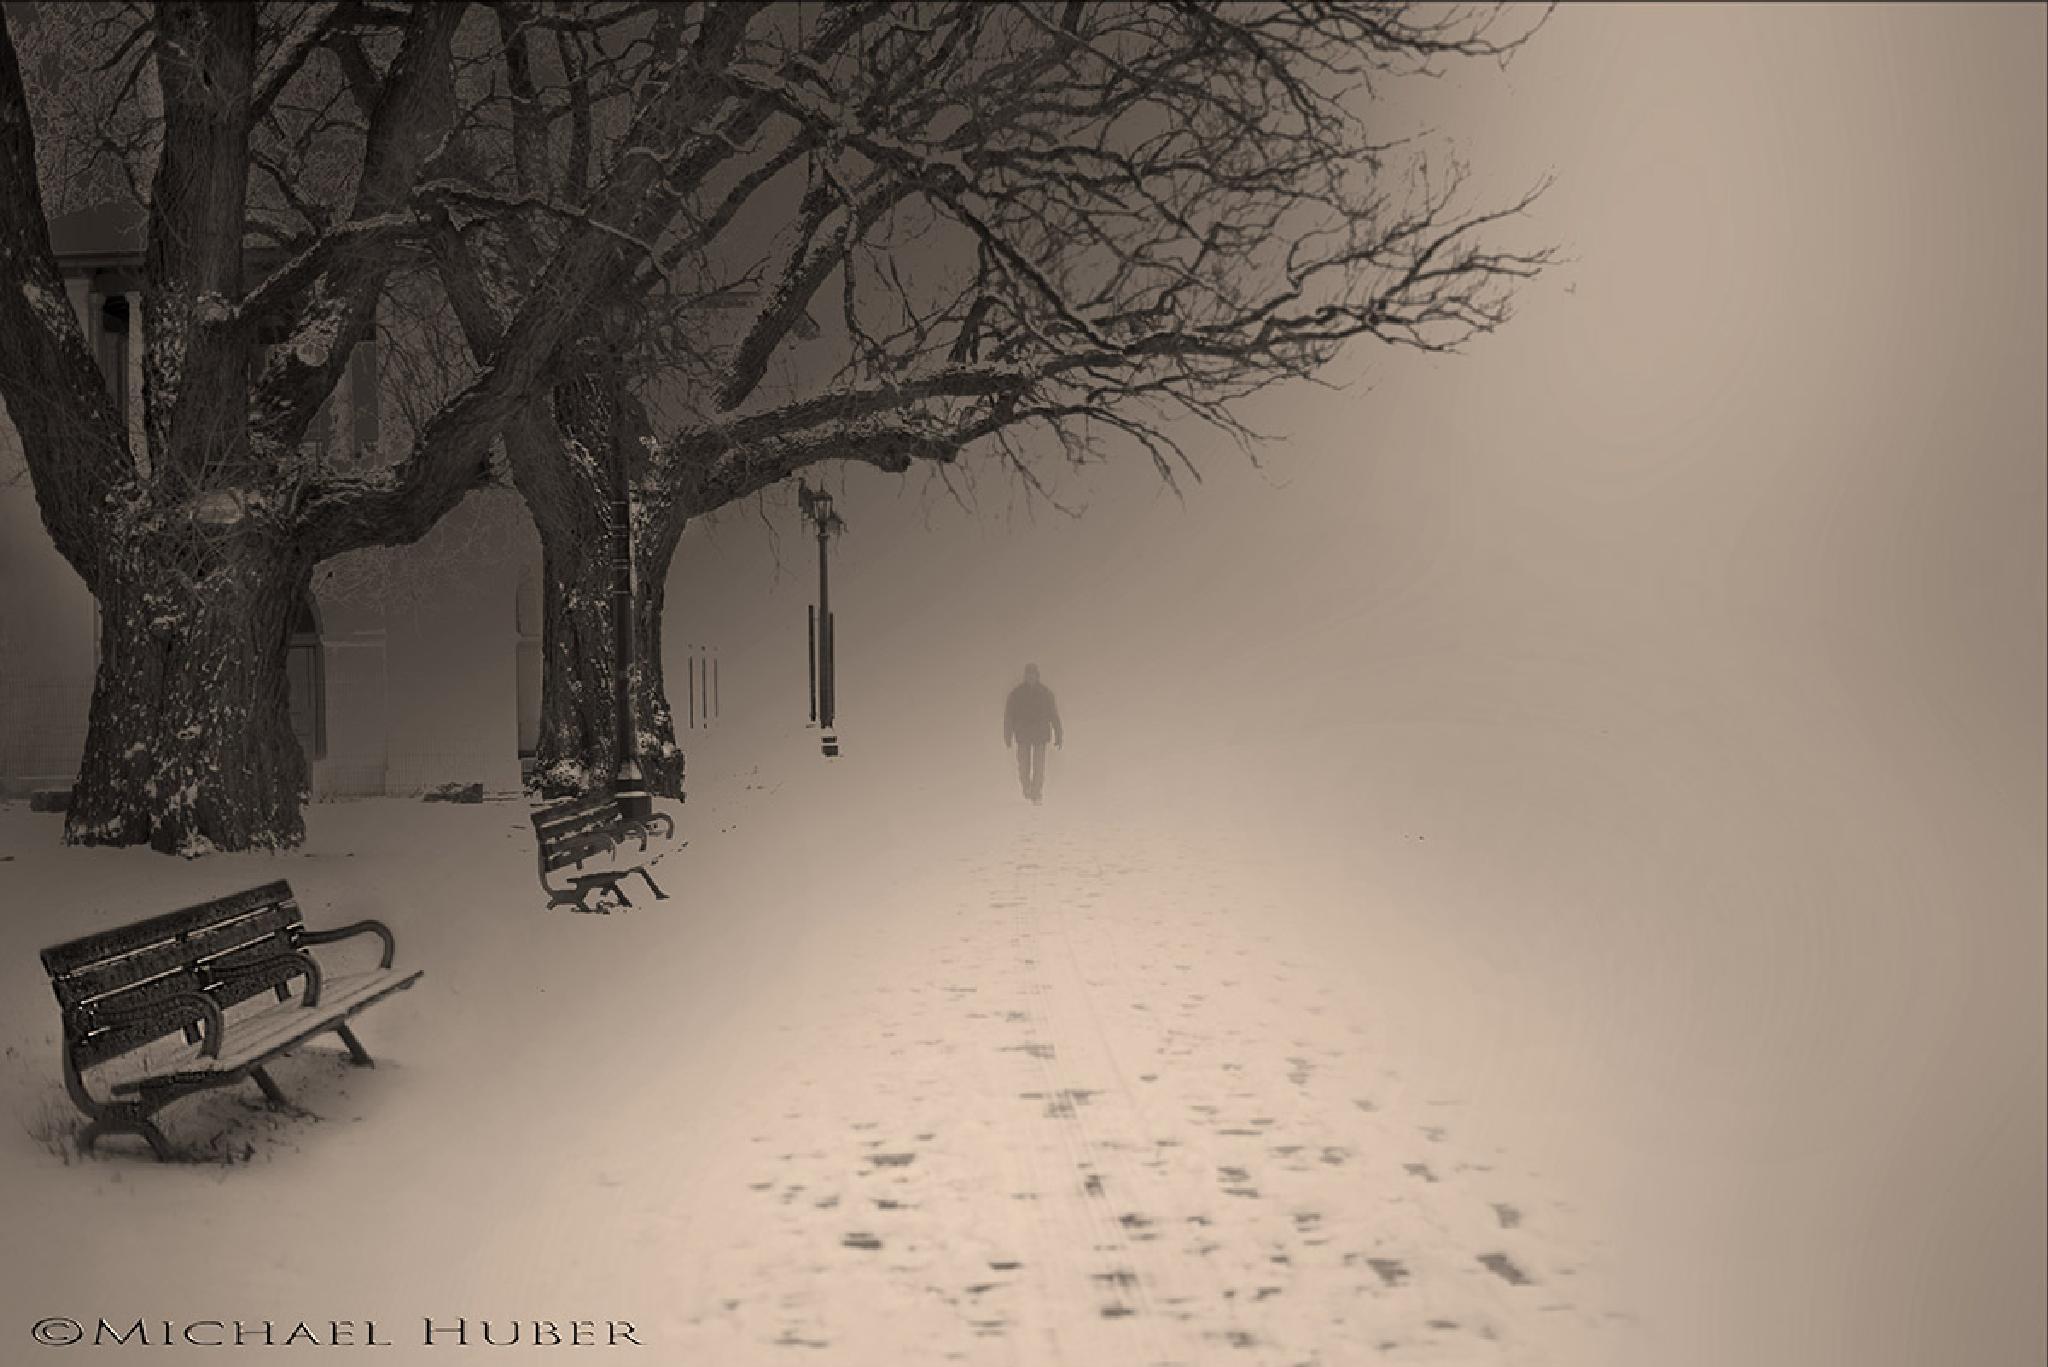 Winter Stroll by Michael Huber